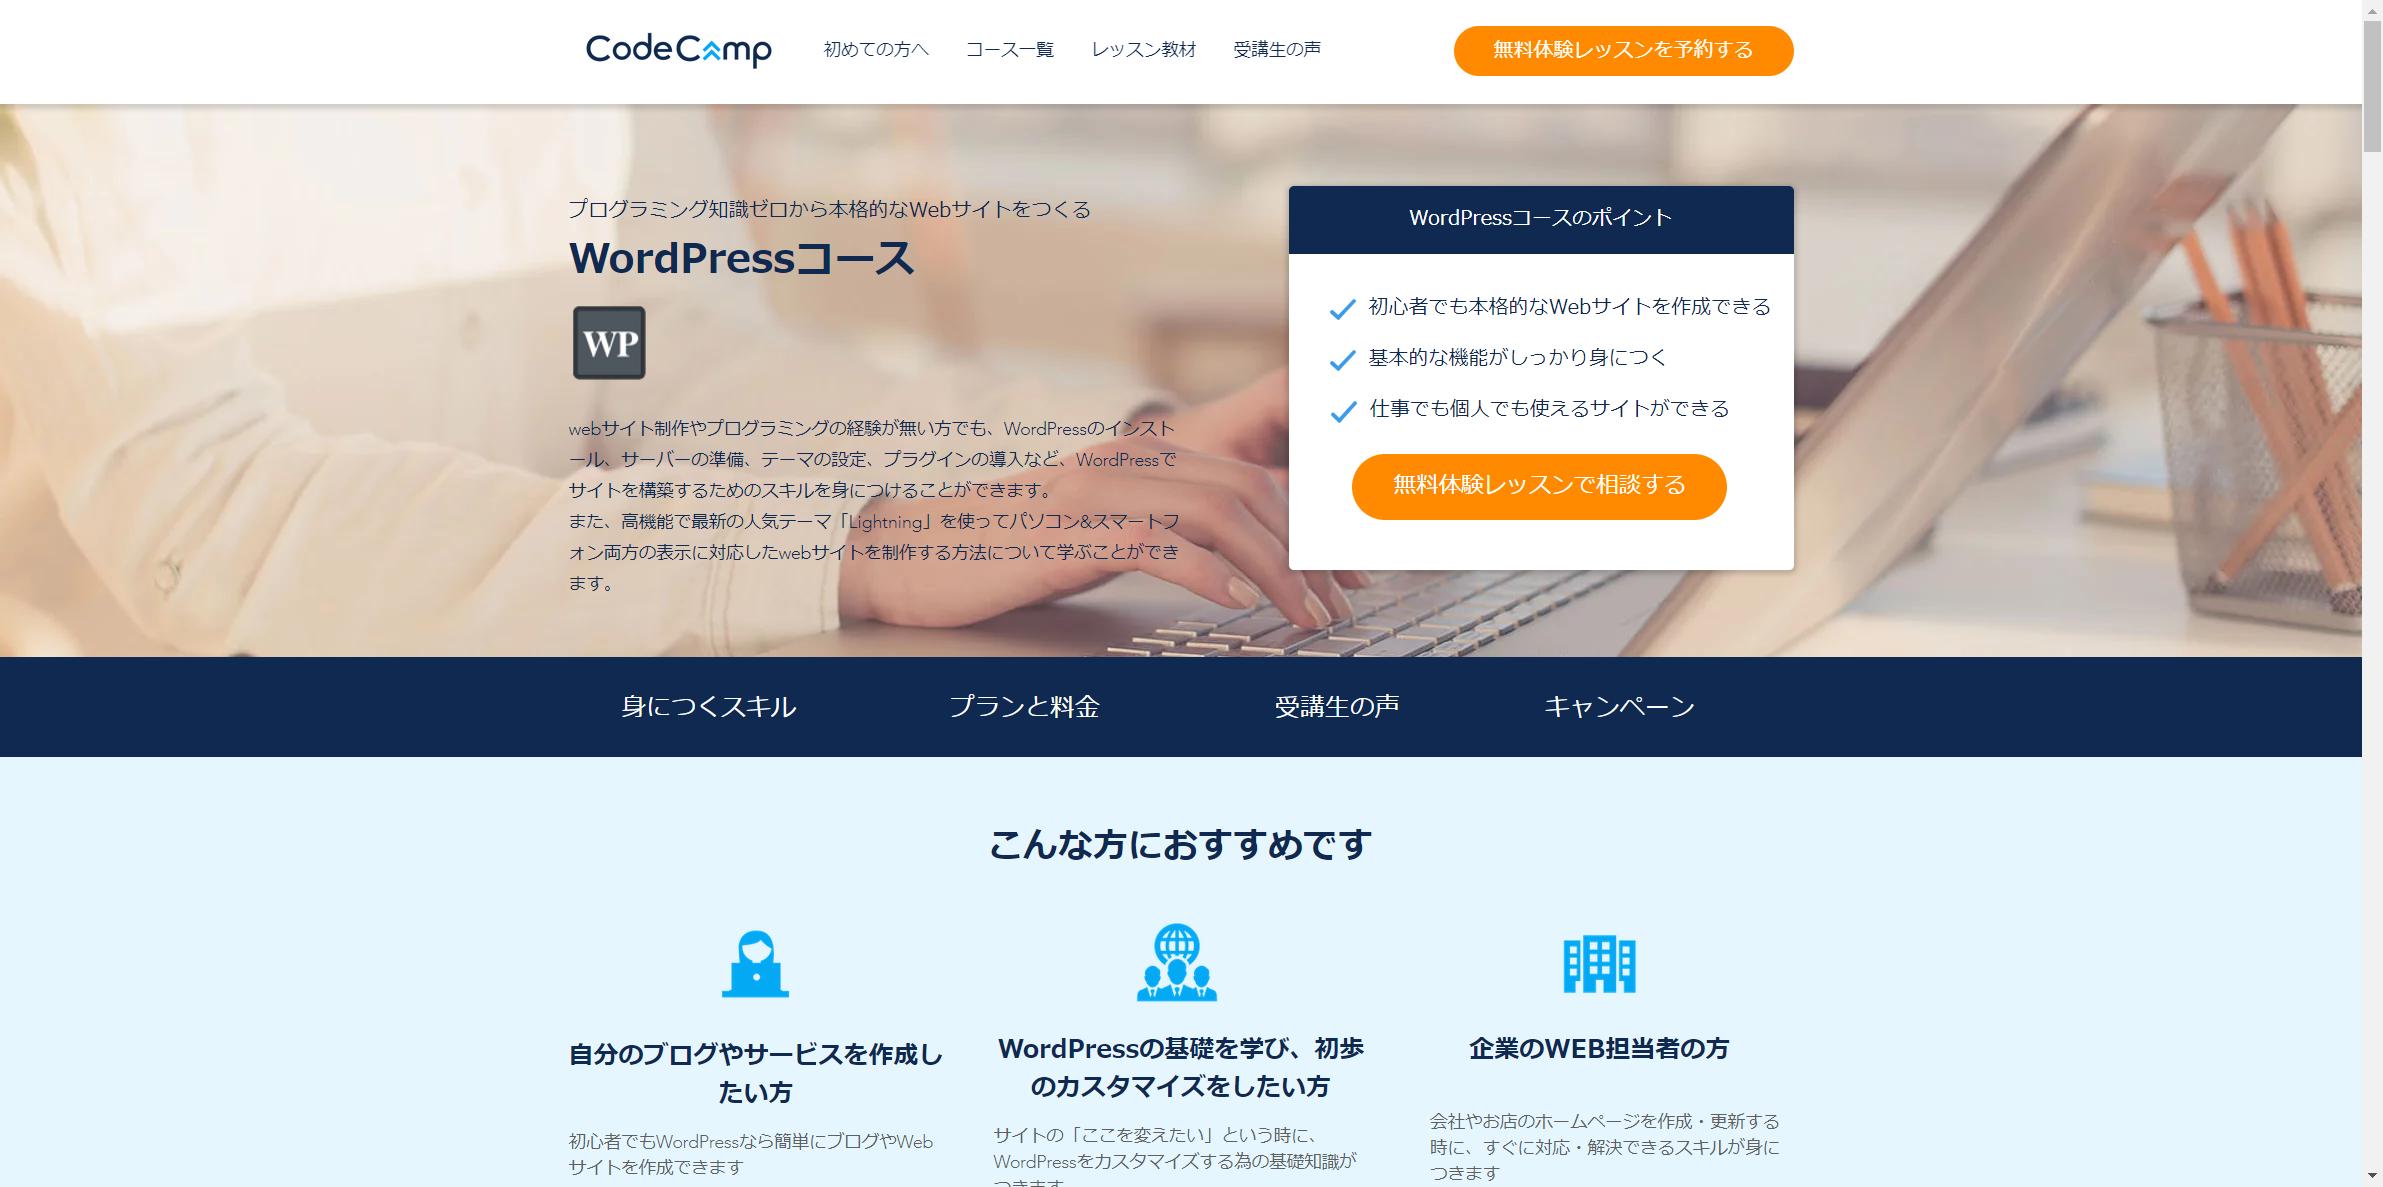 CodeCamp Wordpressコース